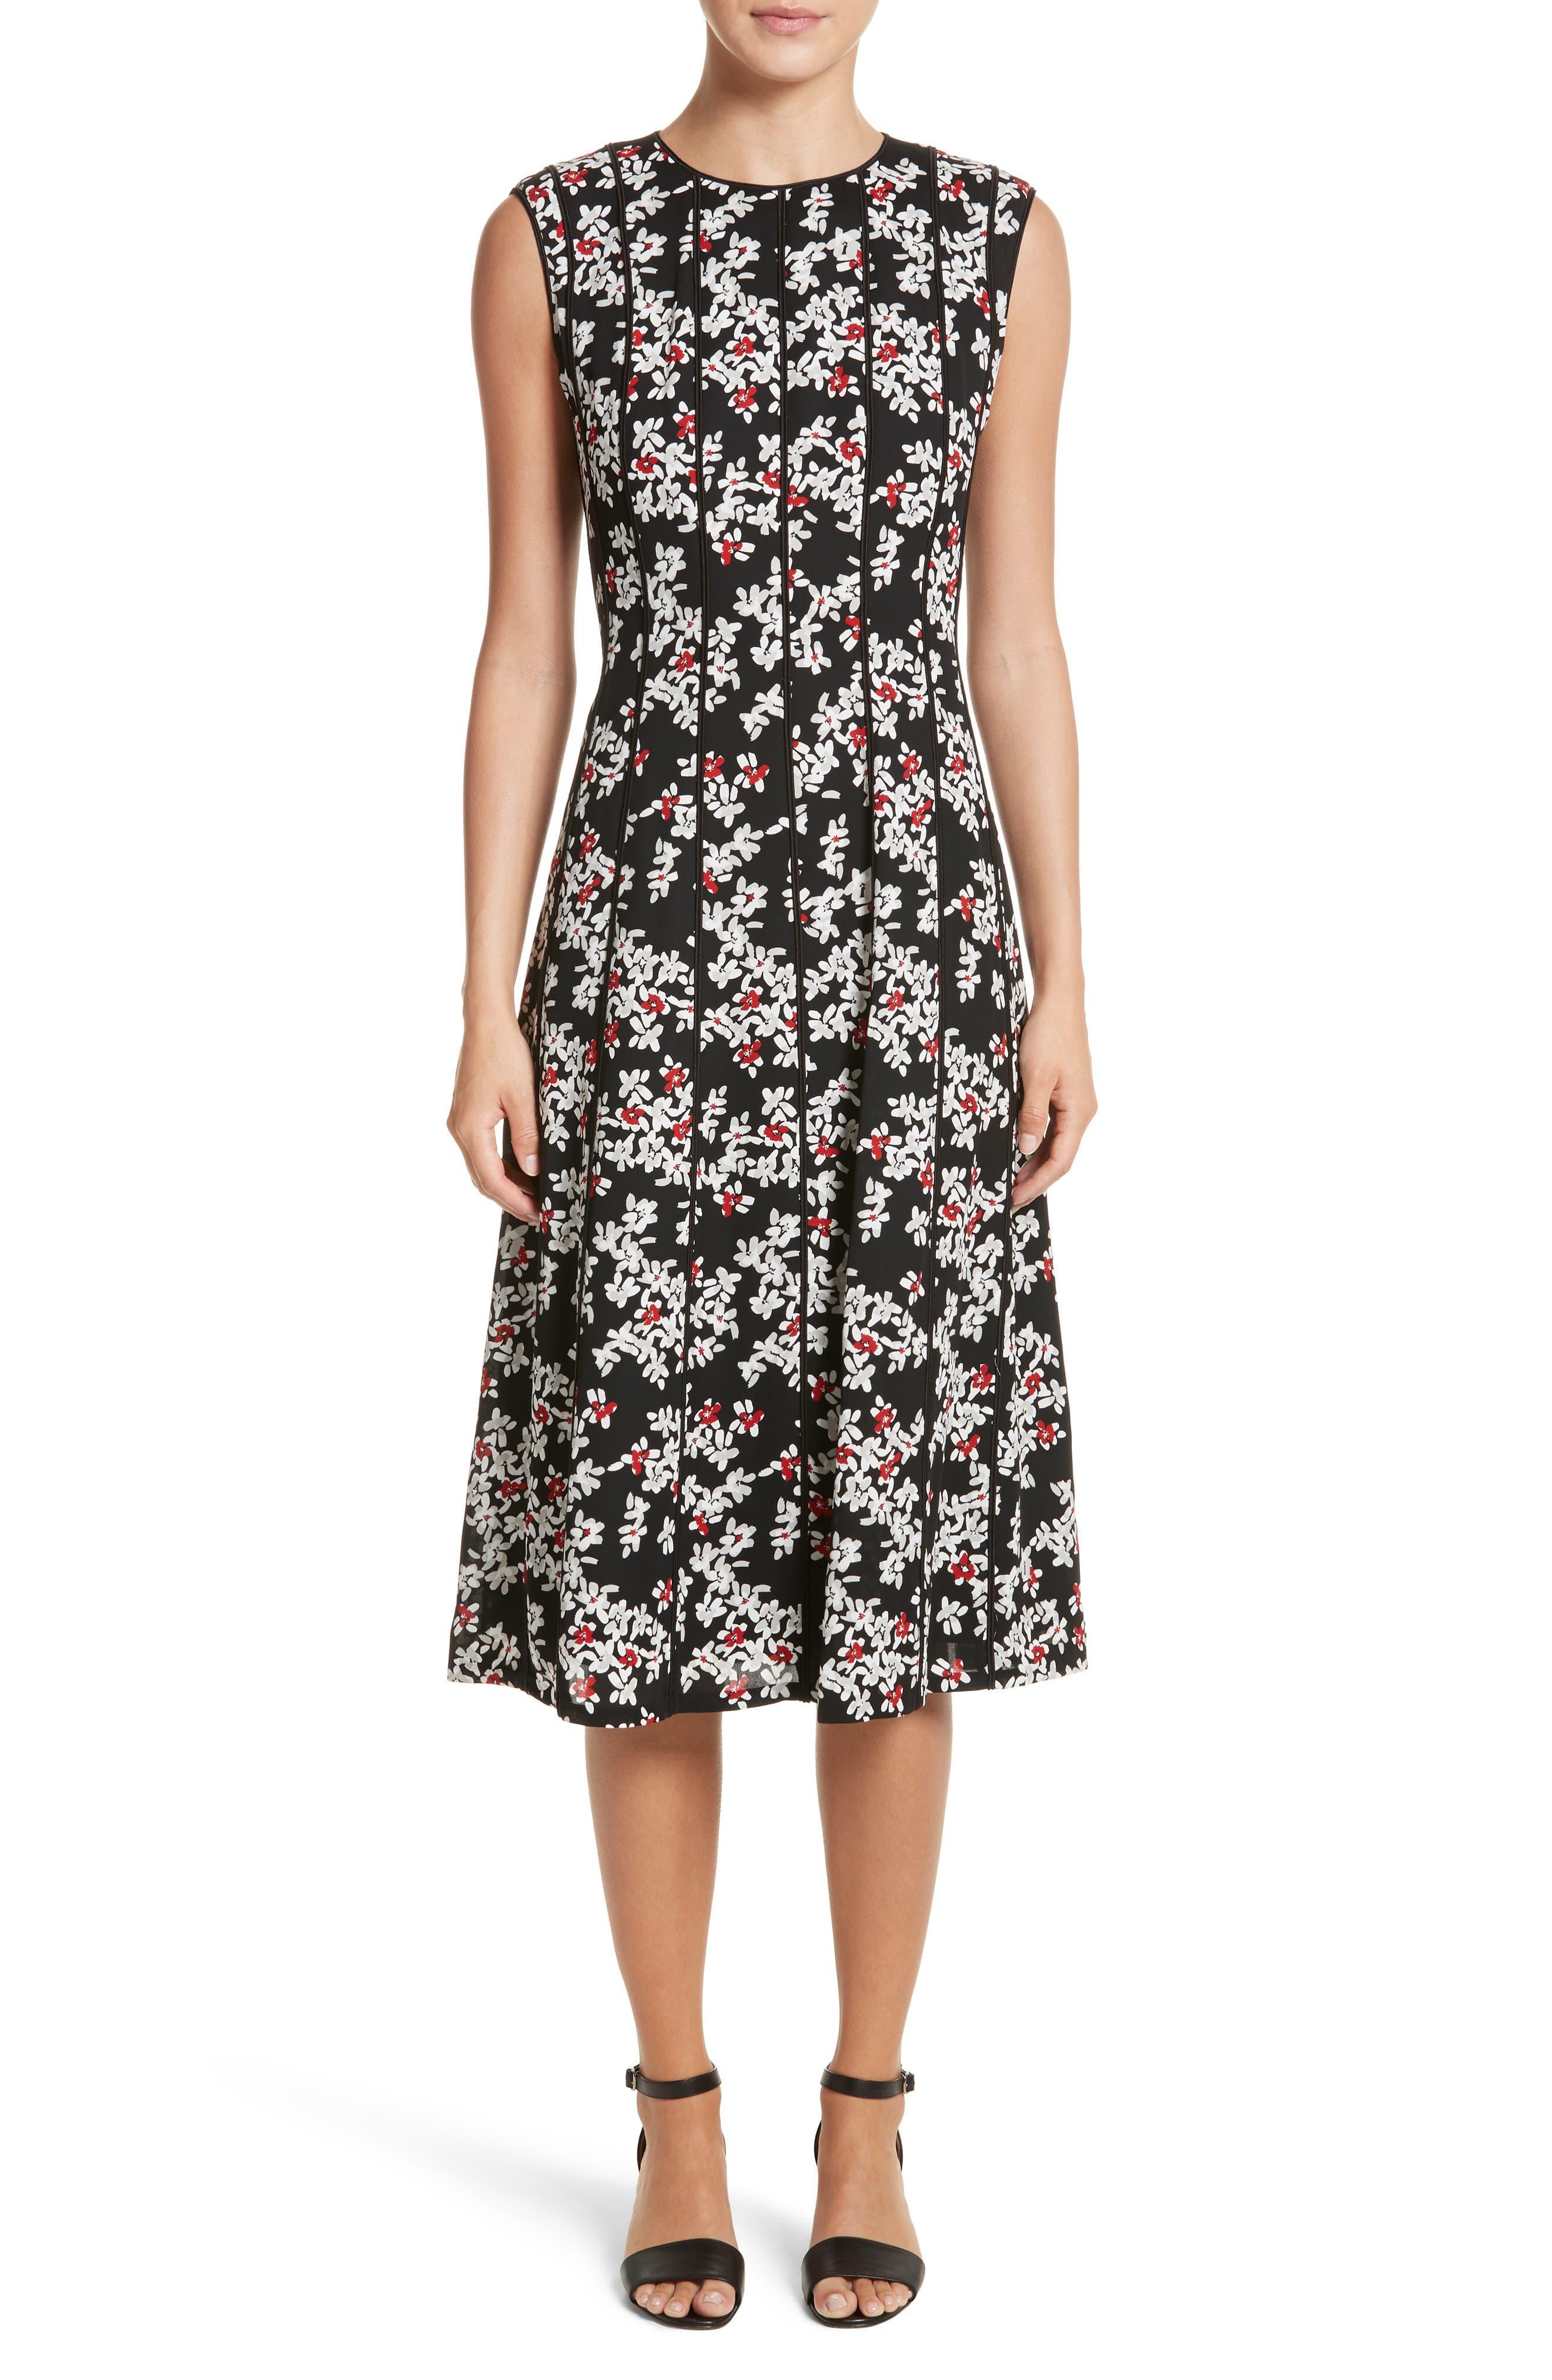 Lafayette 148 New York Marley Fresh Floral Drape Cloth Dress